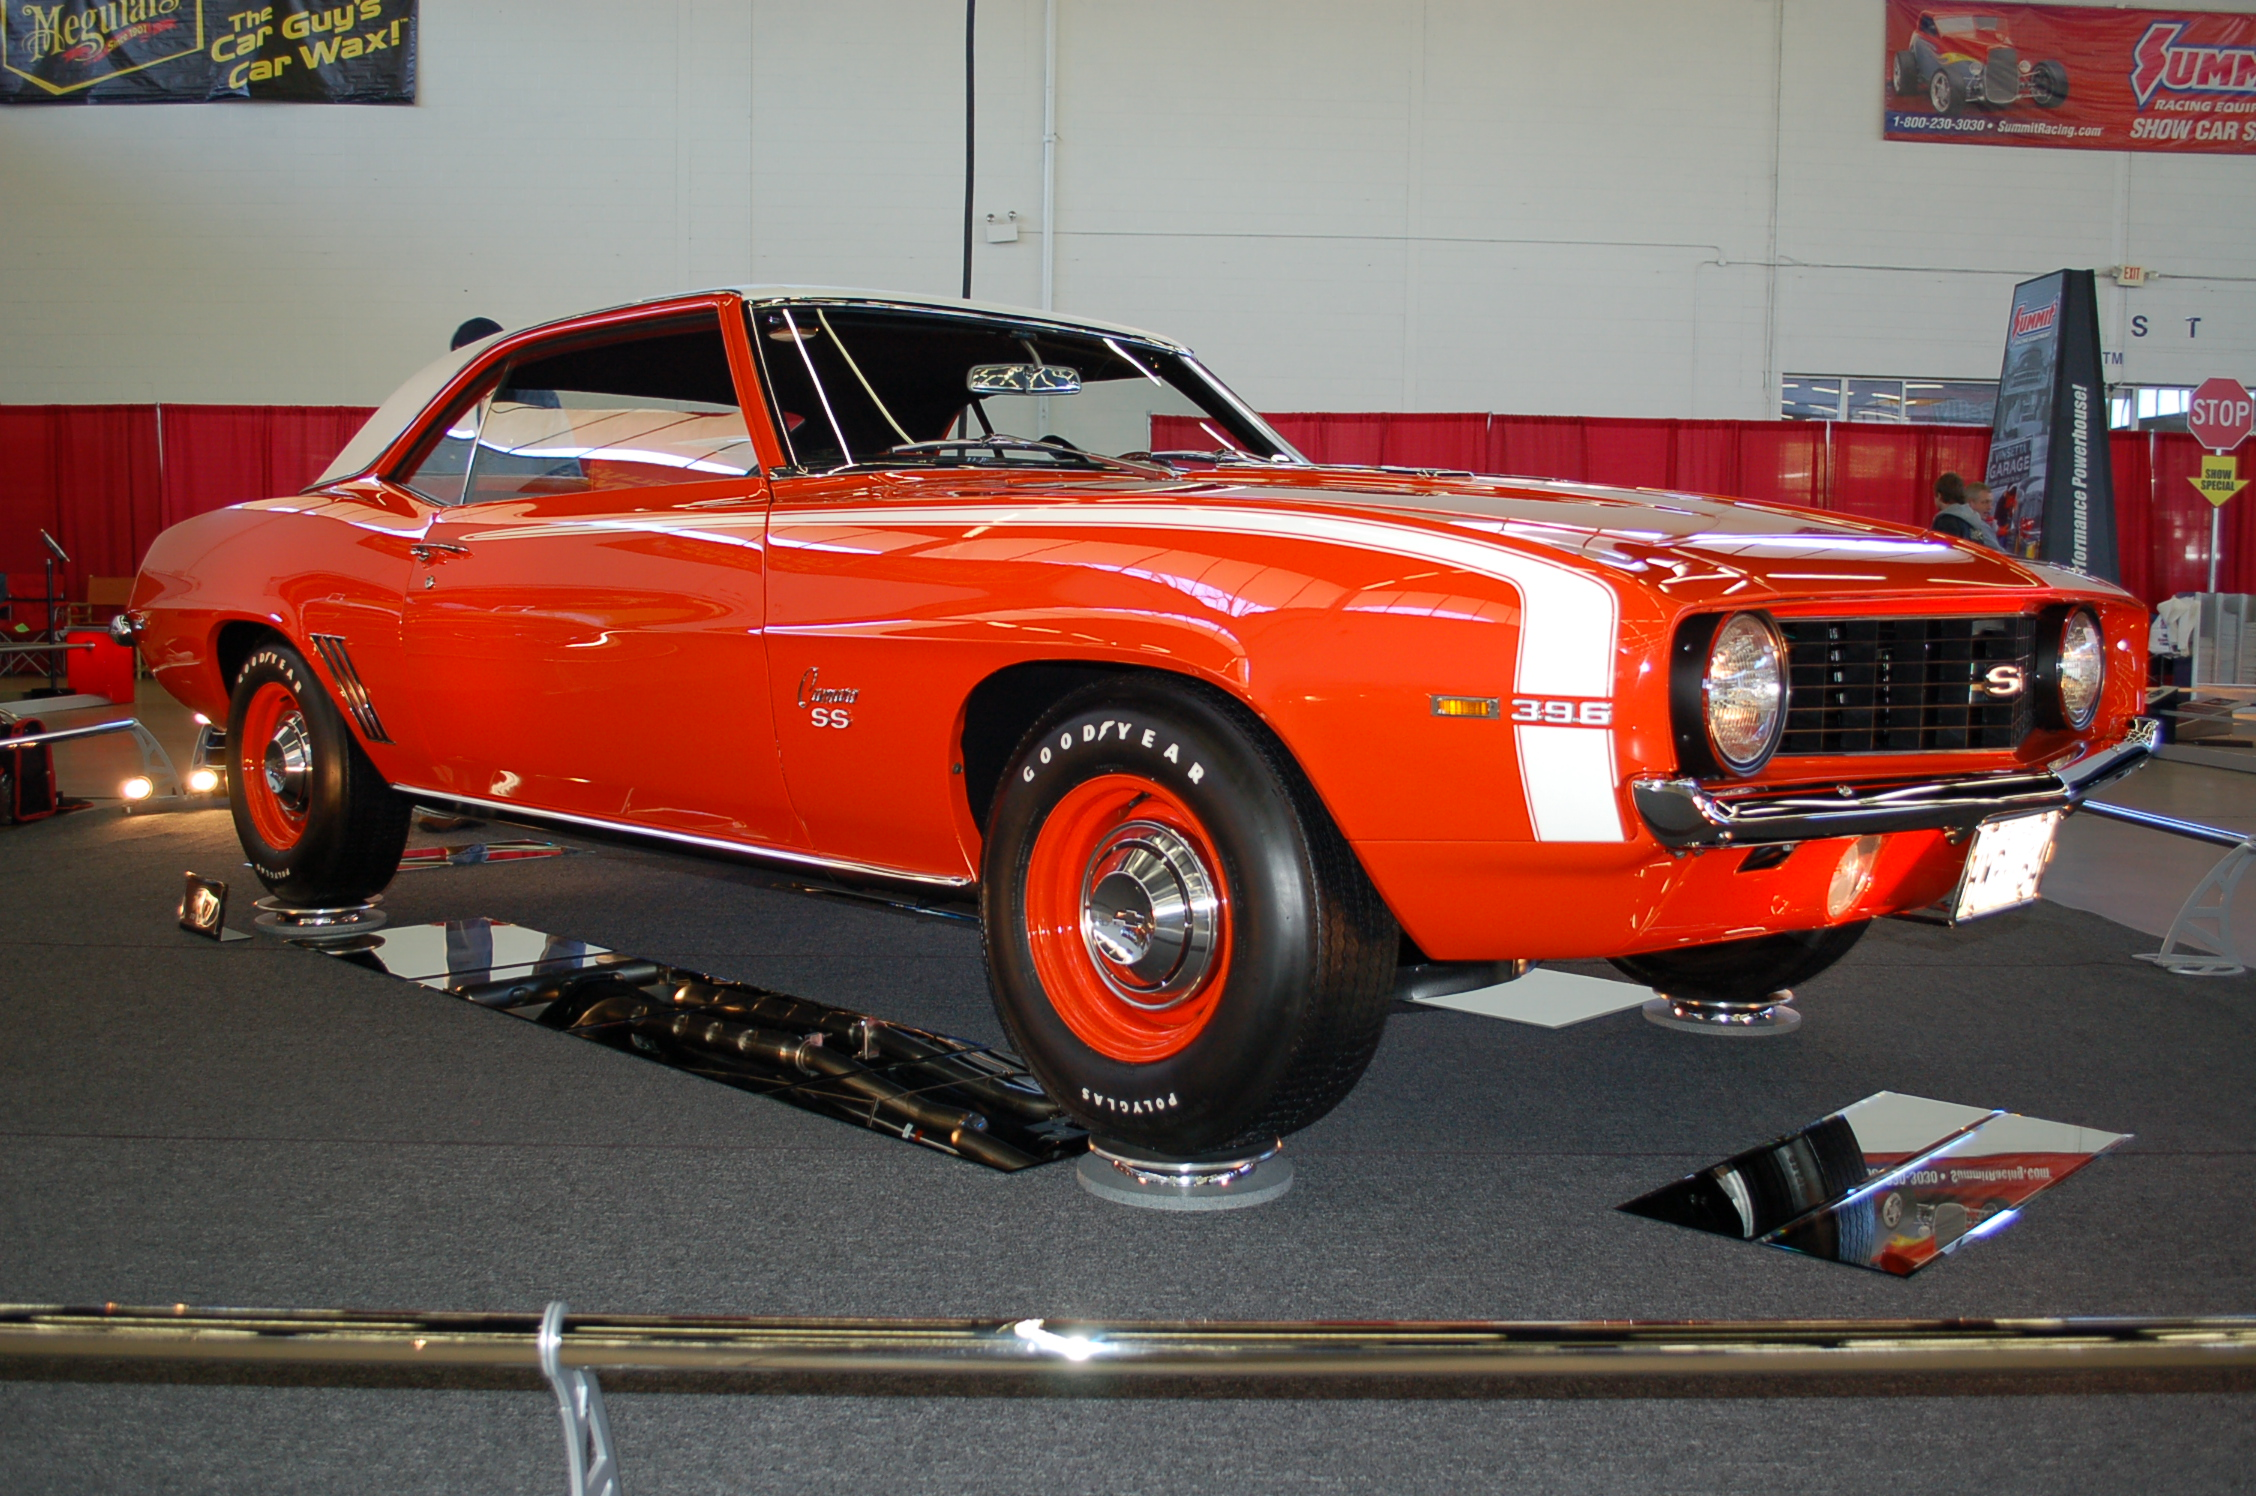 Mac Bernd's 1969 Chevy Camaro SS • Best Restored, Best in Class